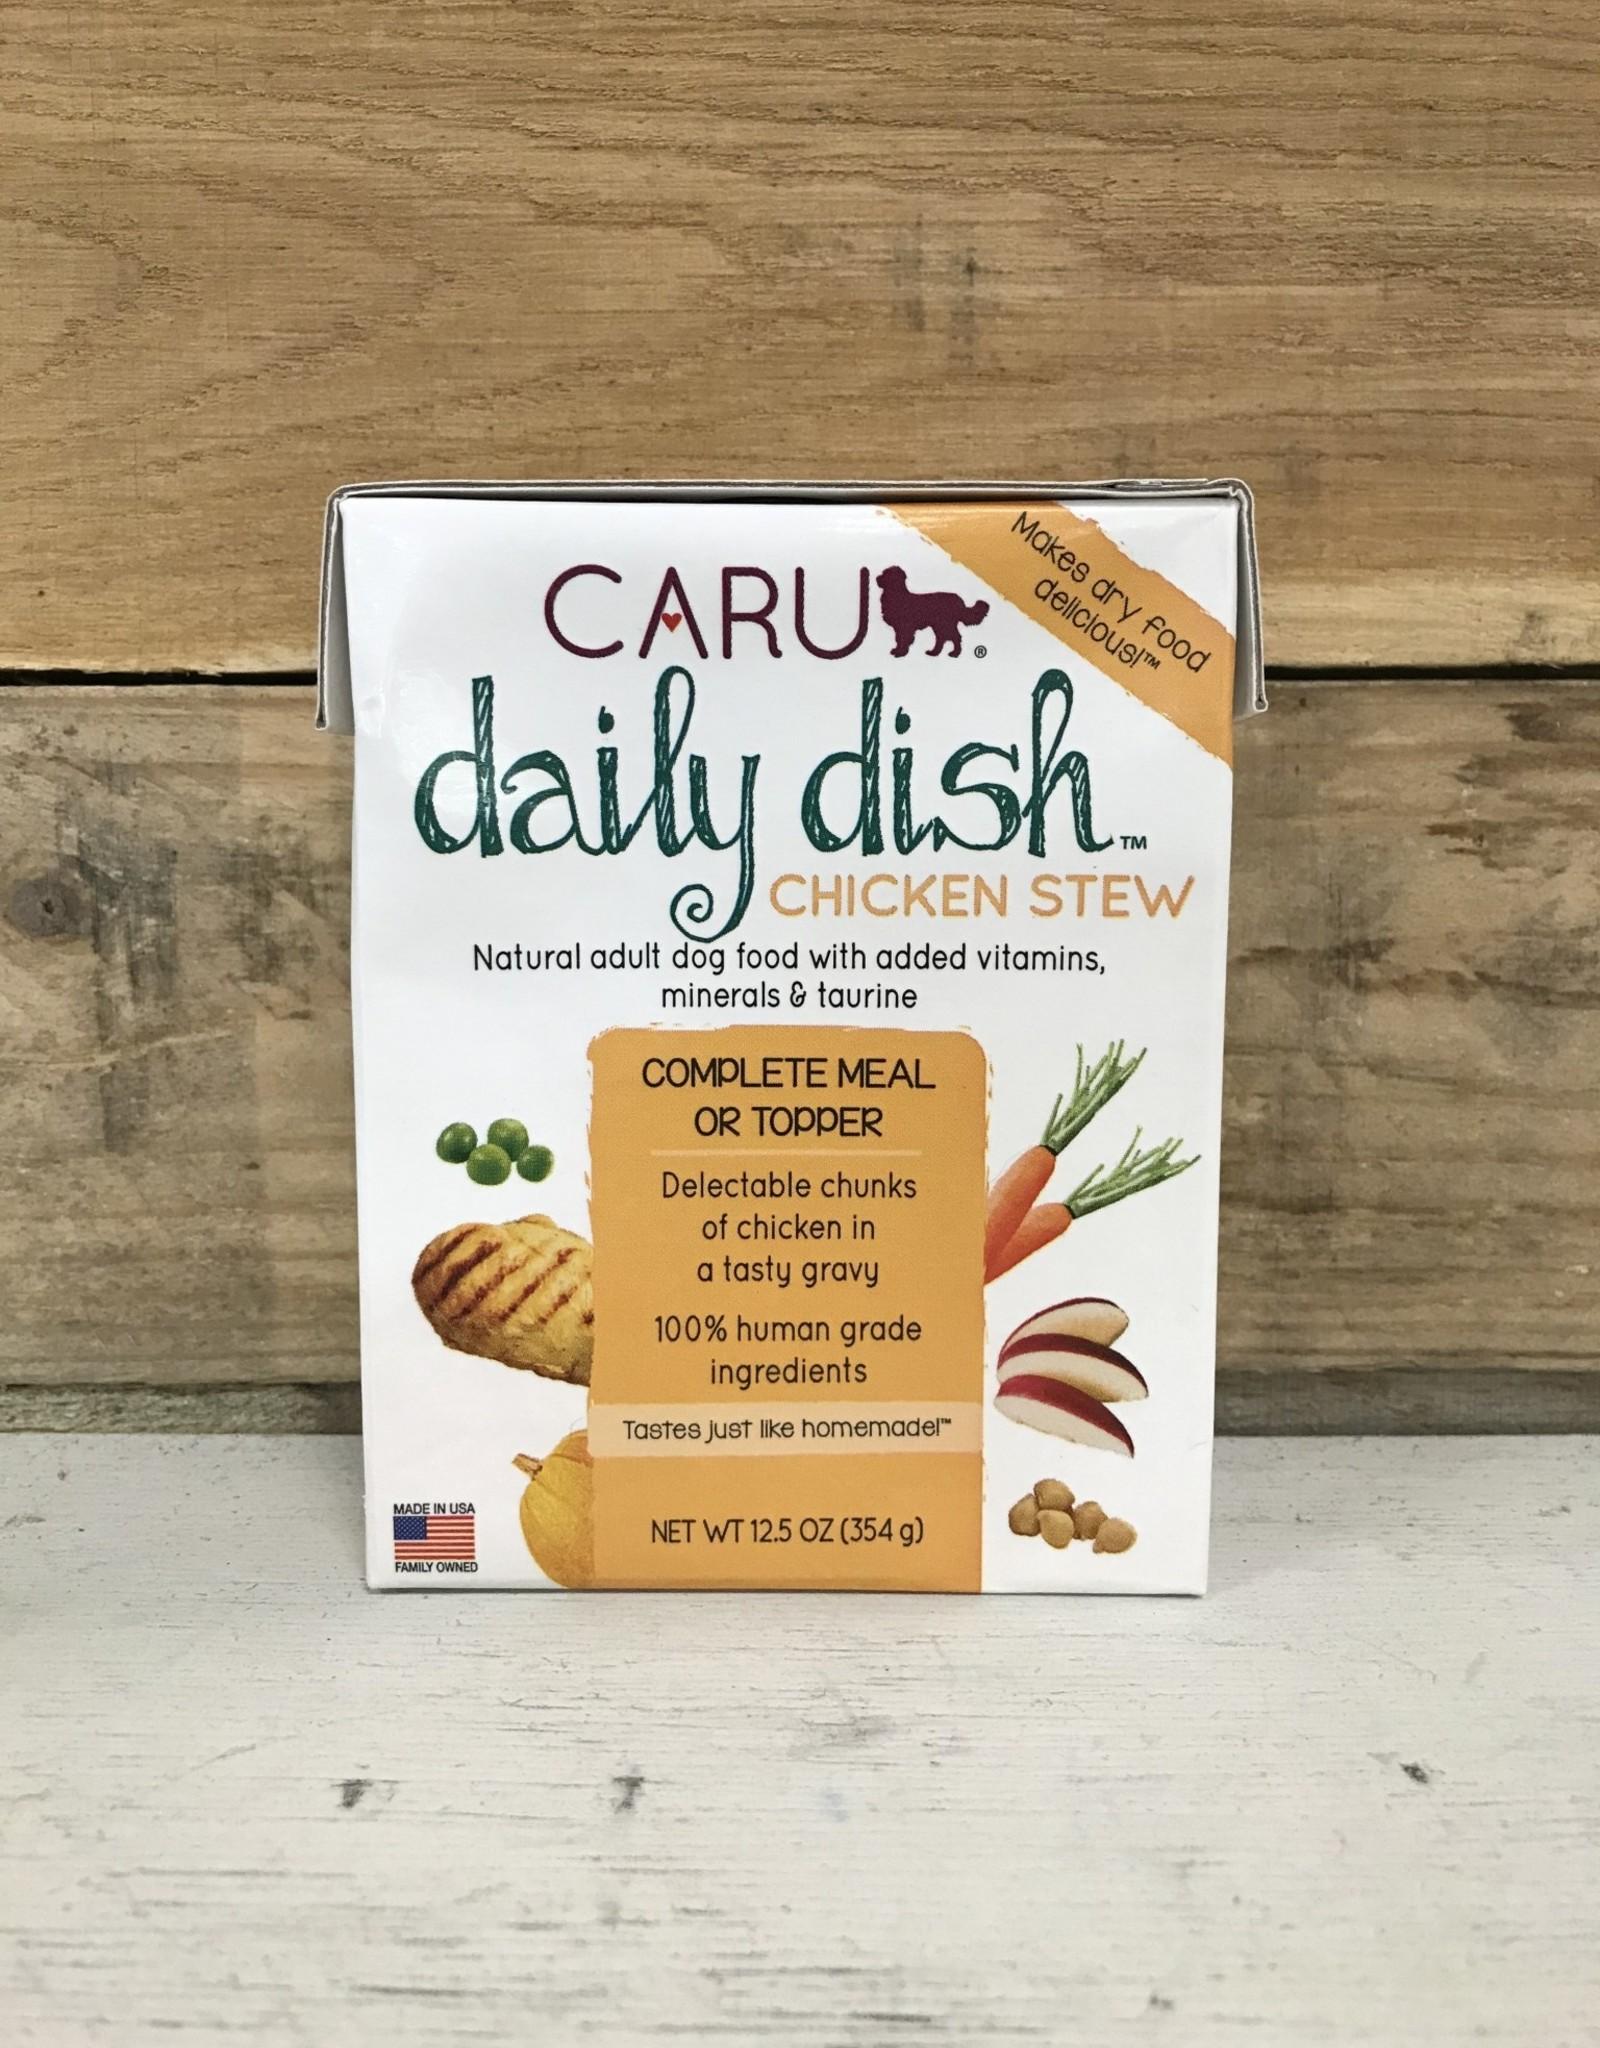 Caru Pet Food CARU Daily Dish Chicken Stew 12.5oz